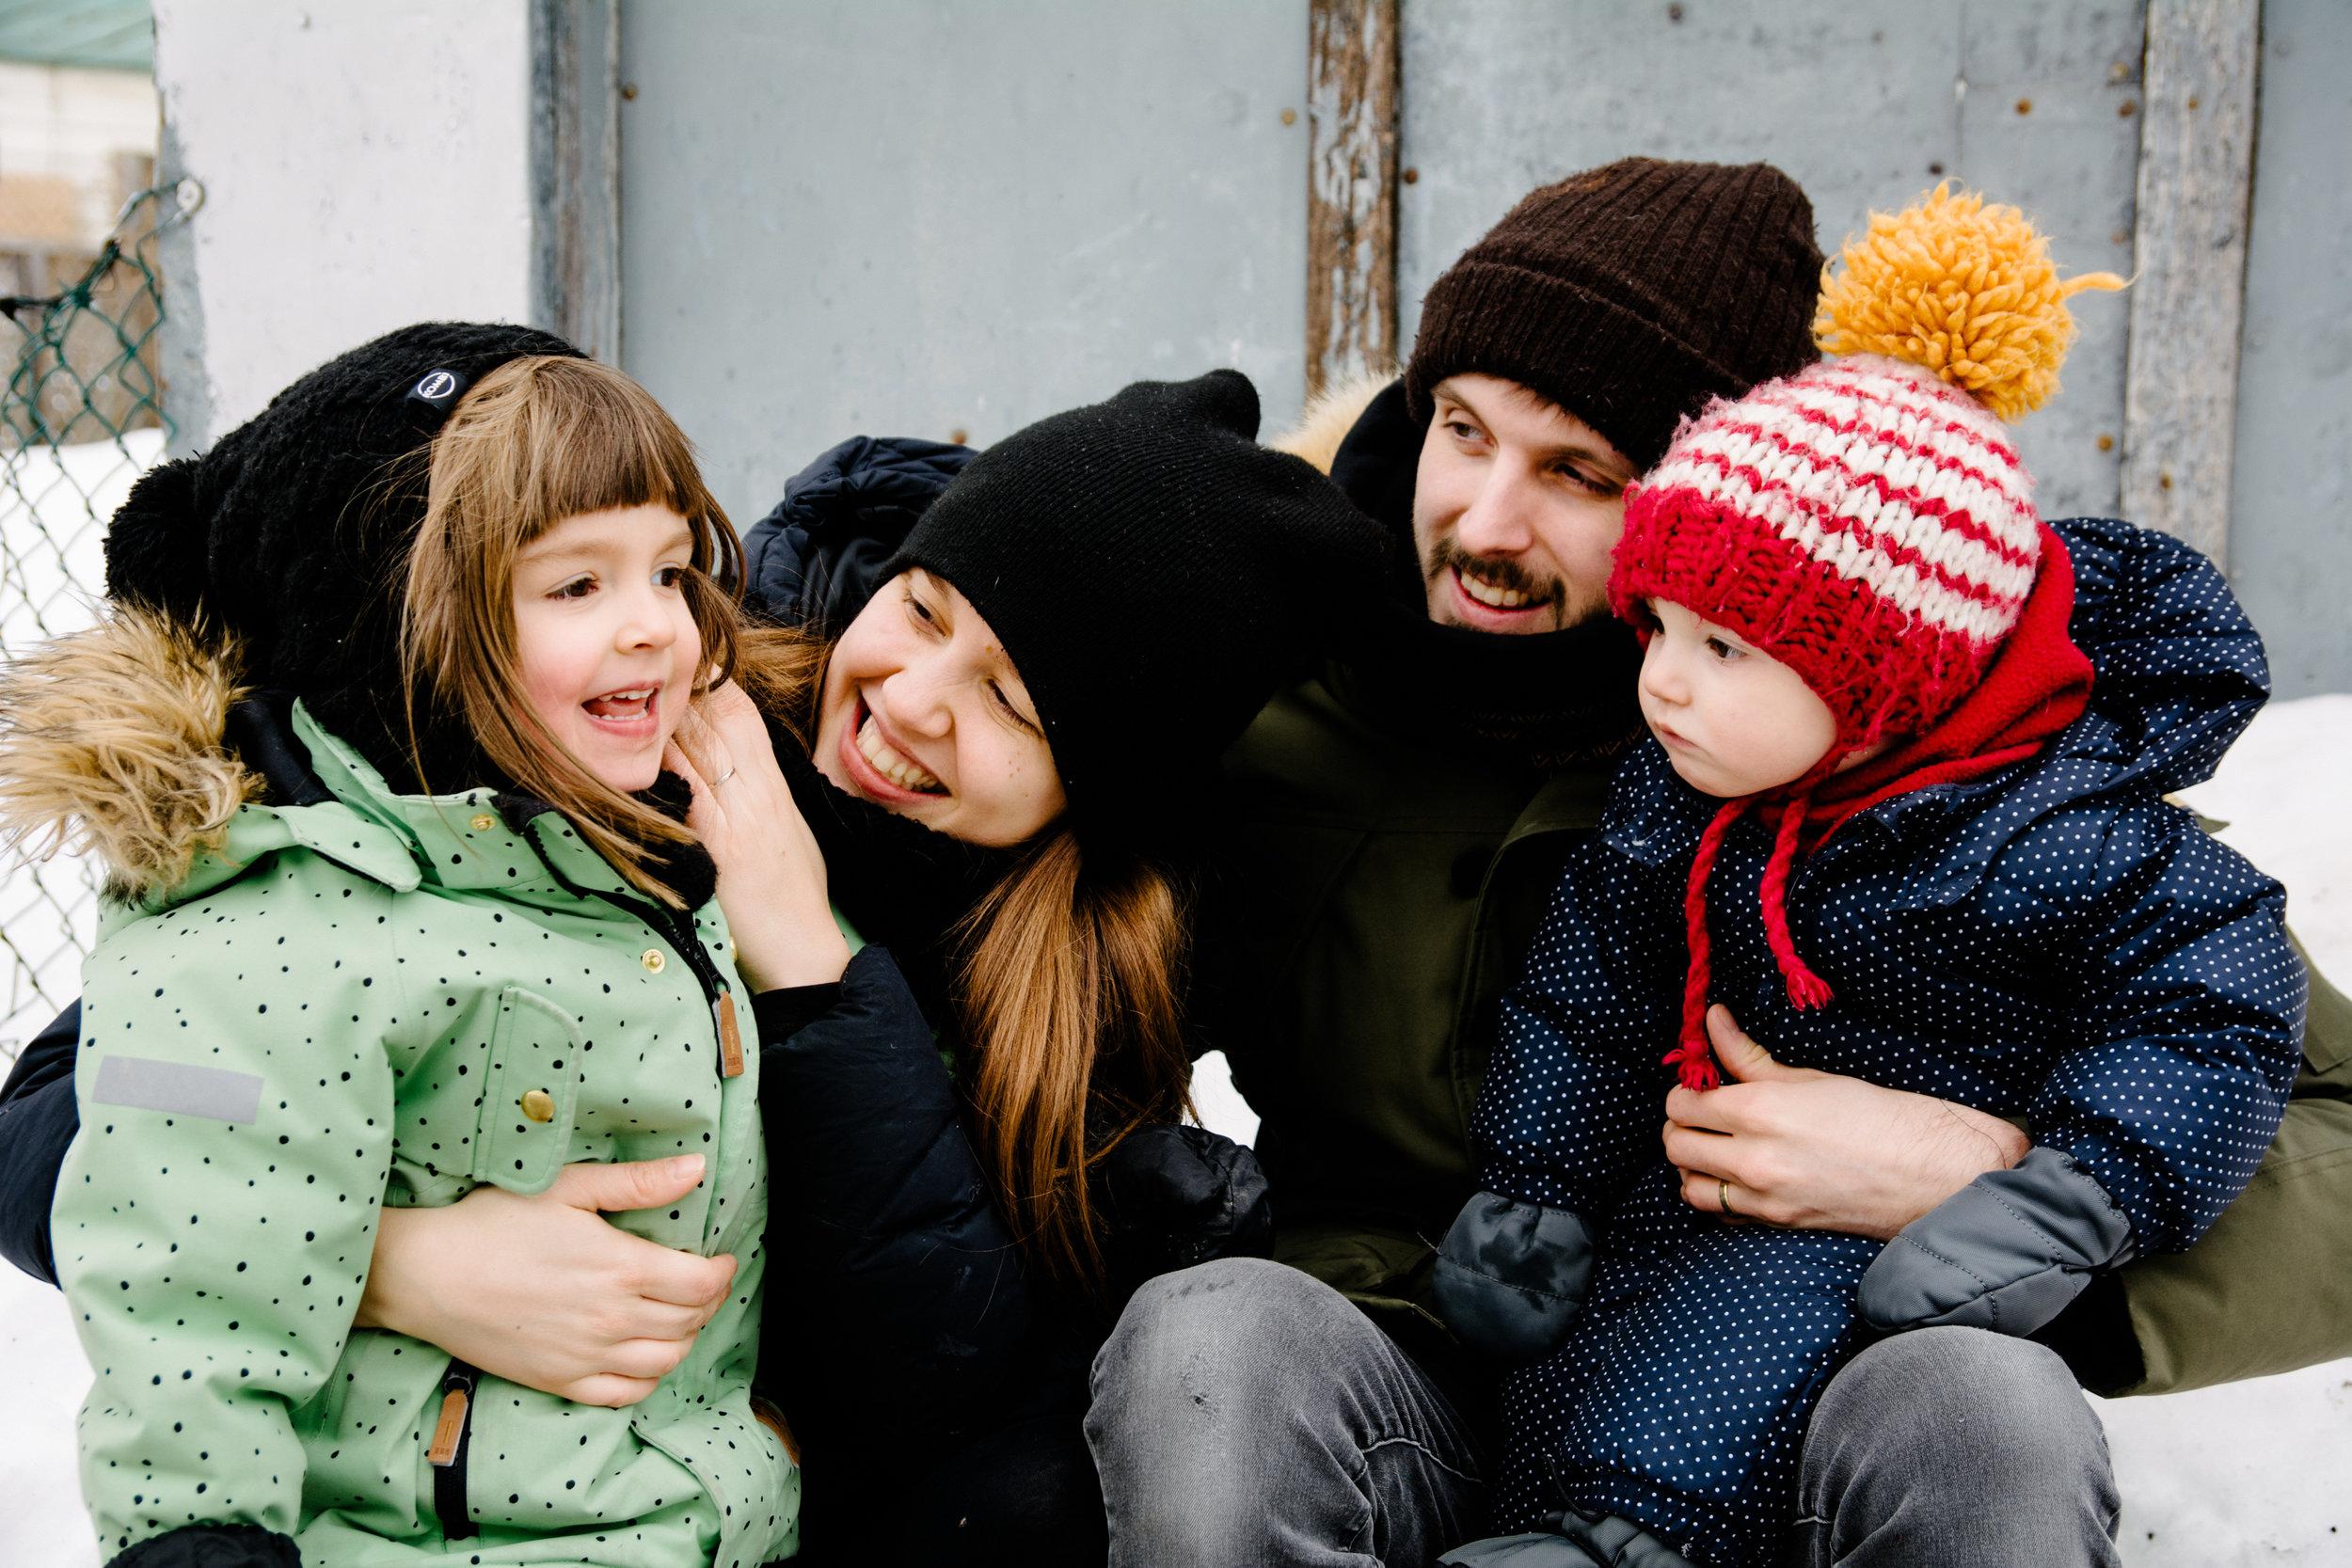 hiver_photo-dune-gamine-qui-sourit-a-pleine-dents-photographe-famille-lifestyle-montreal-5.jpg